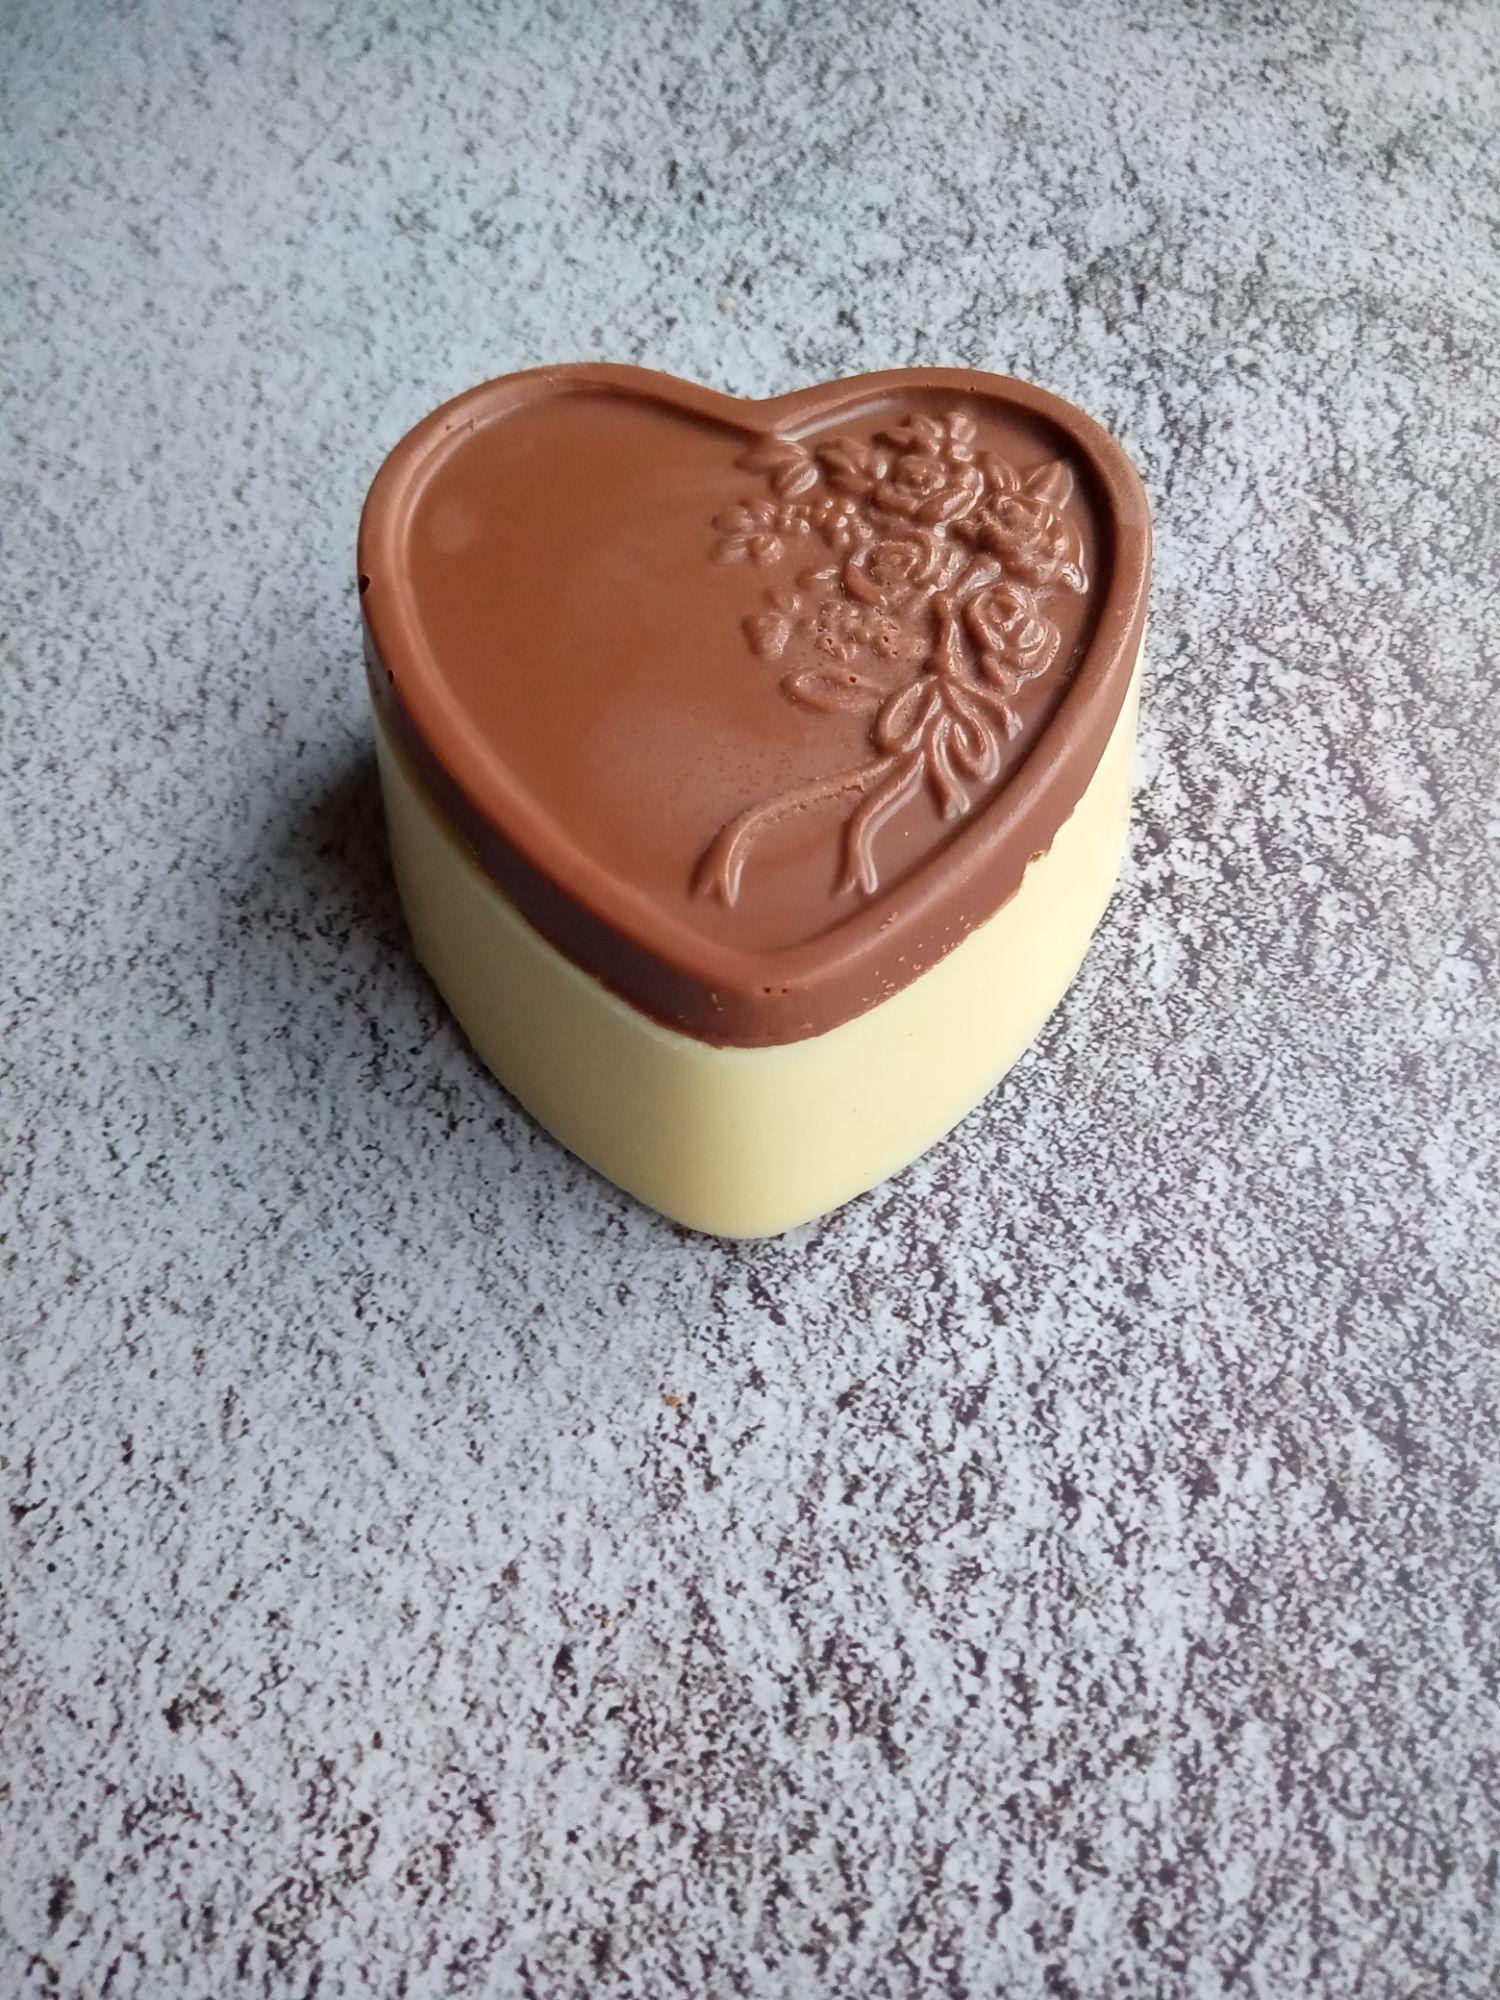 Chocolate Pour Box